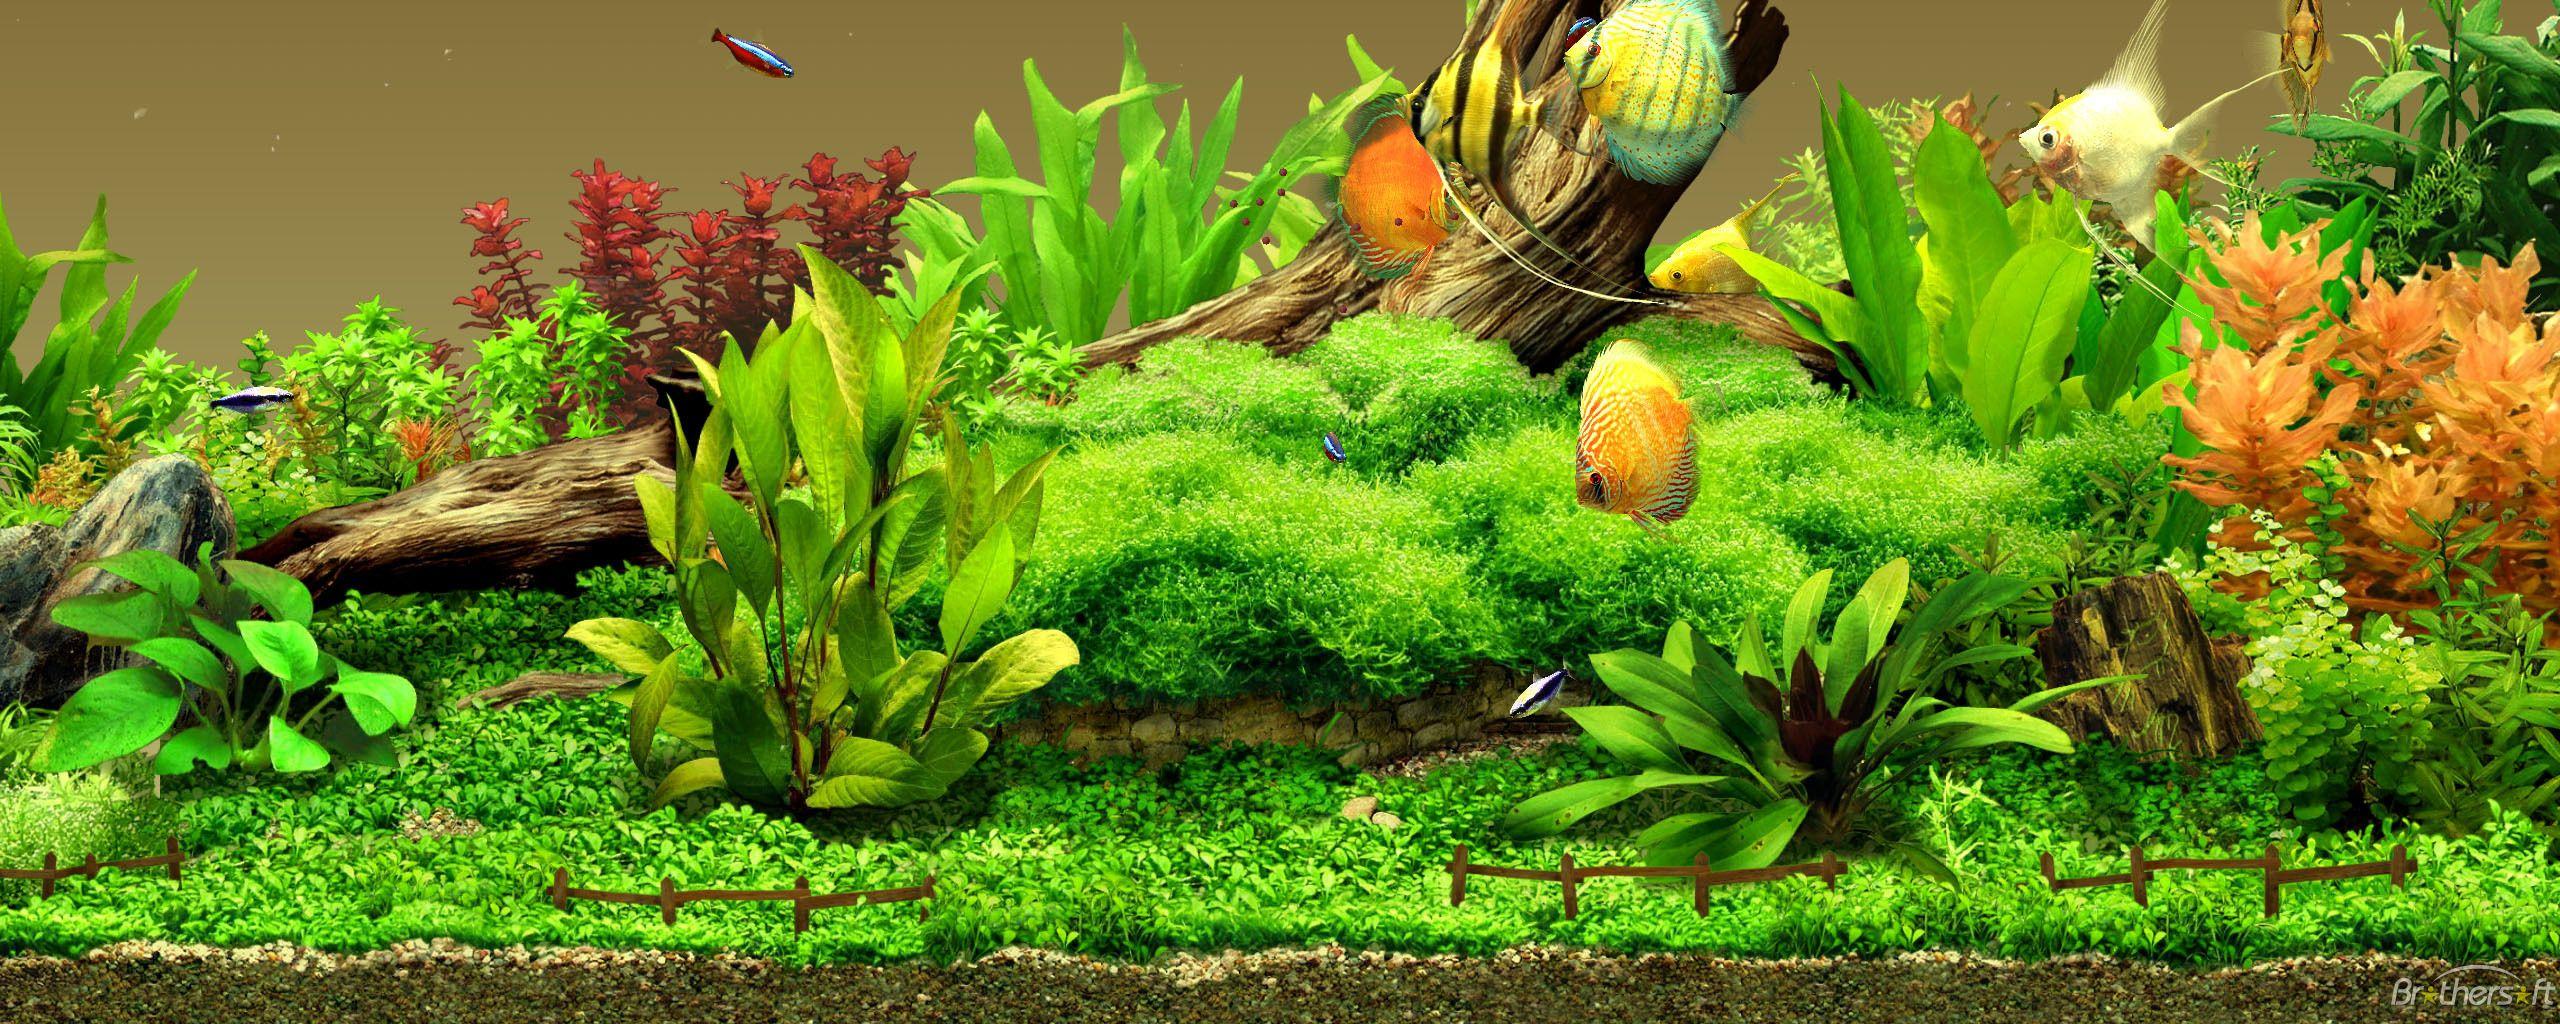 aquatic gardening | Aquarium live wallpaper, Aquarium ...